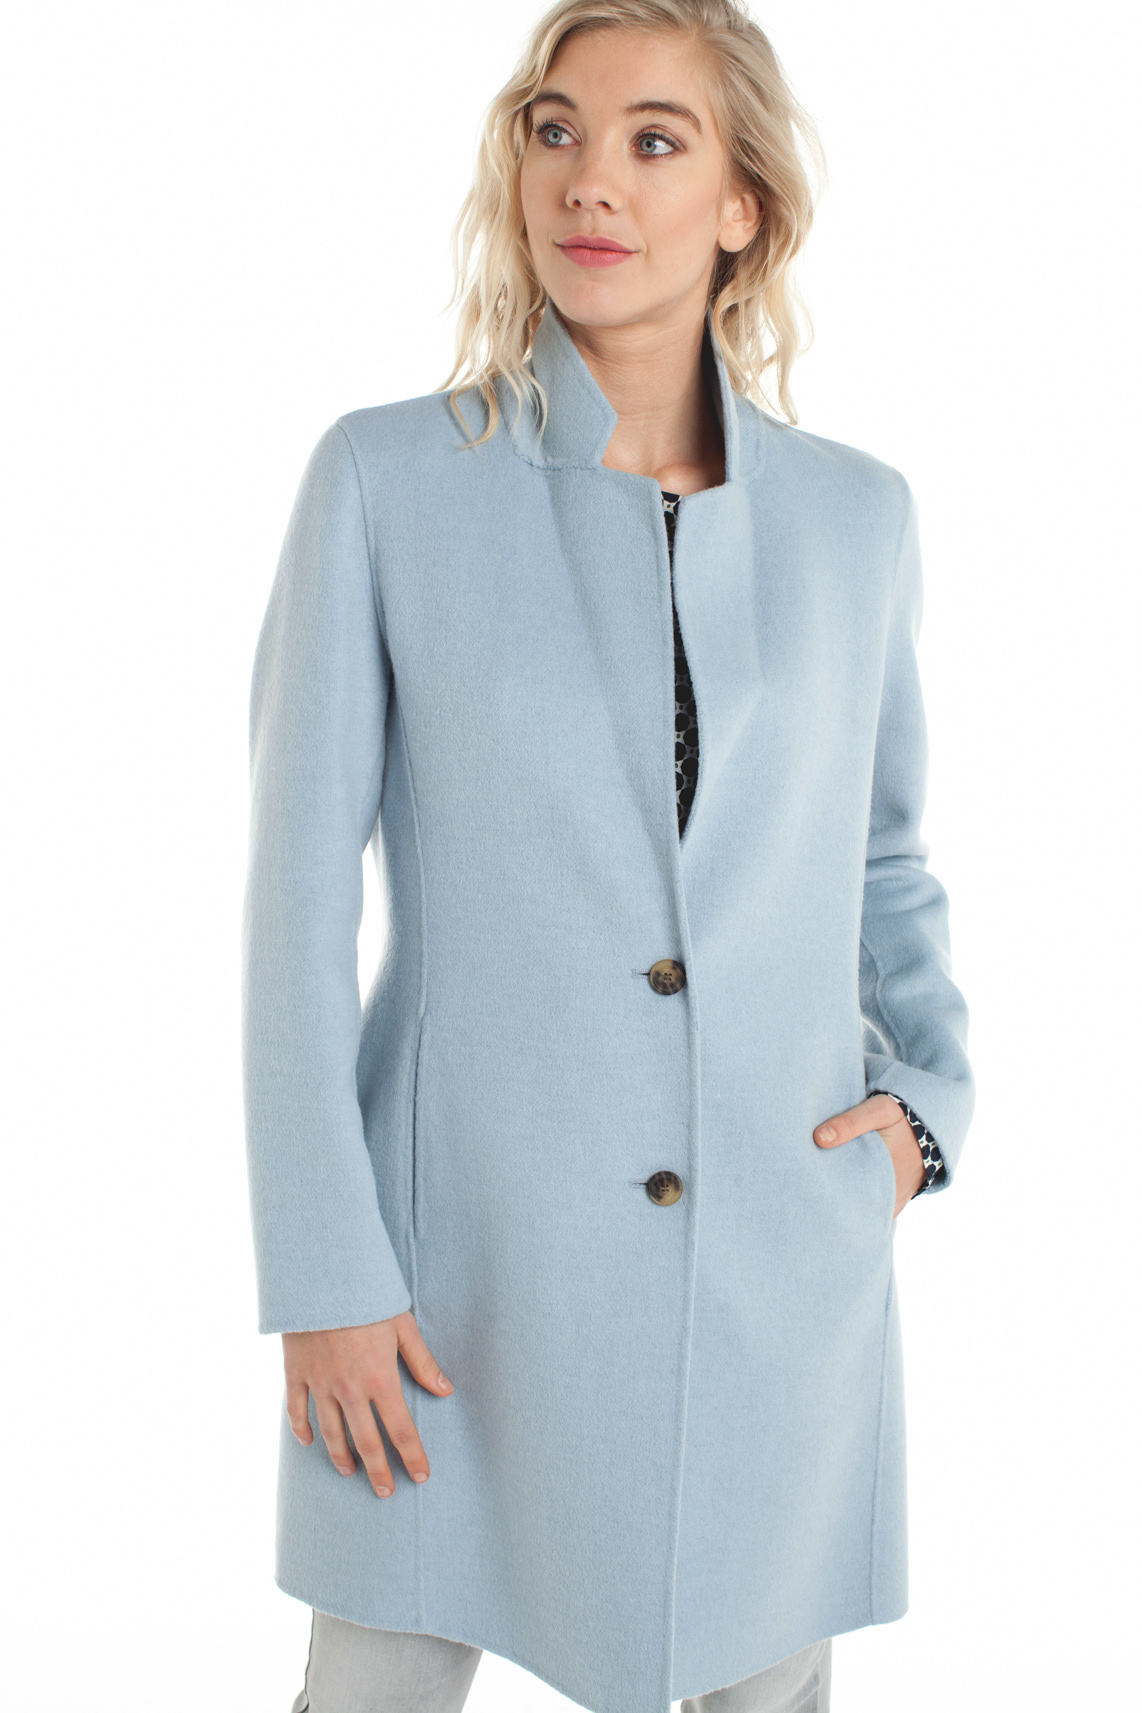 Beaumont Dames Lange wolmix mantel Blauw